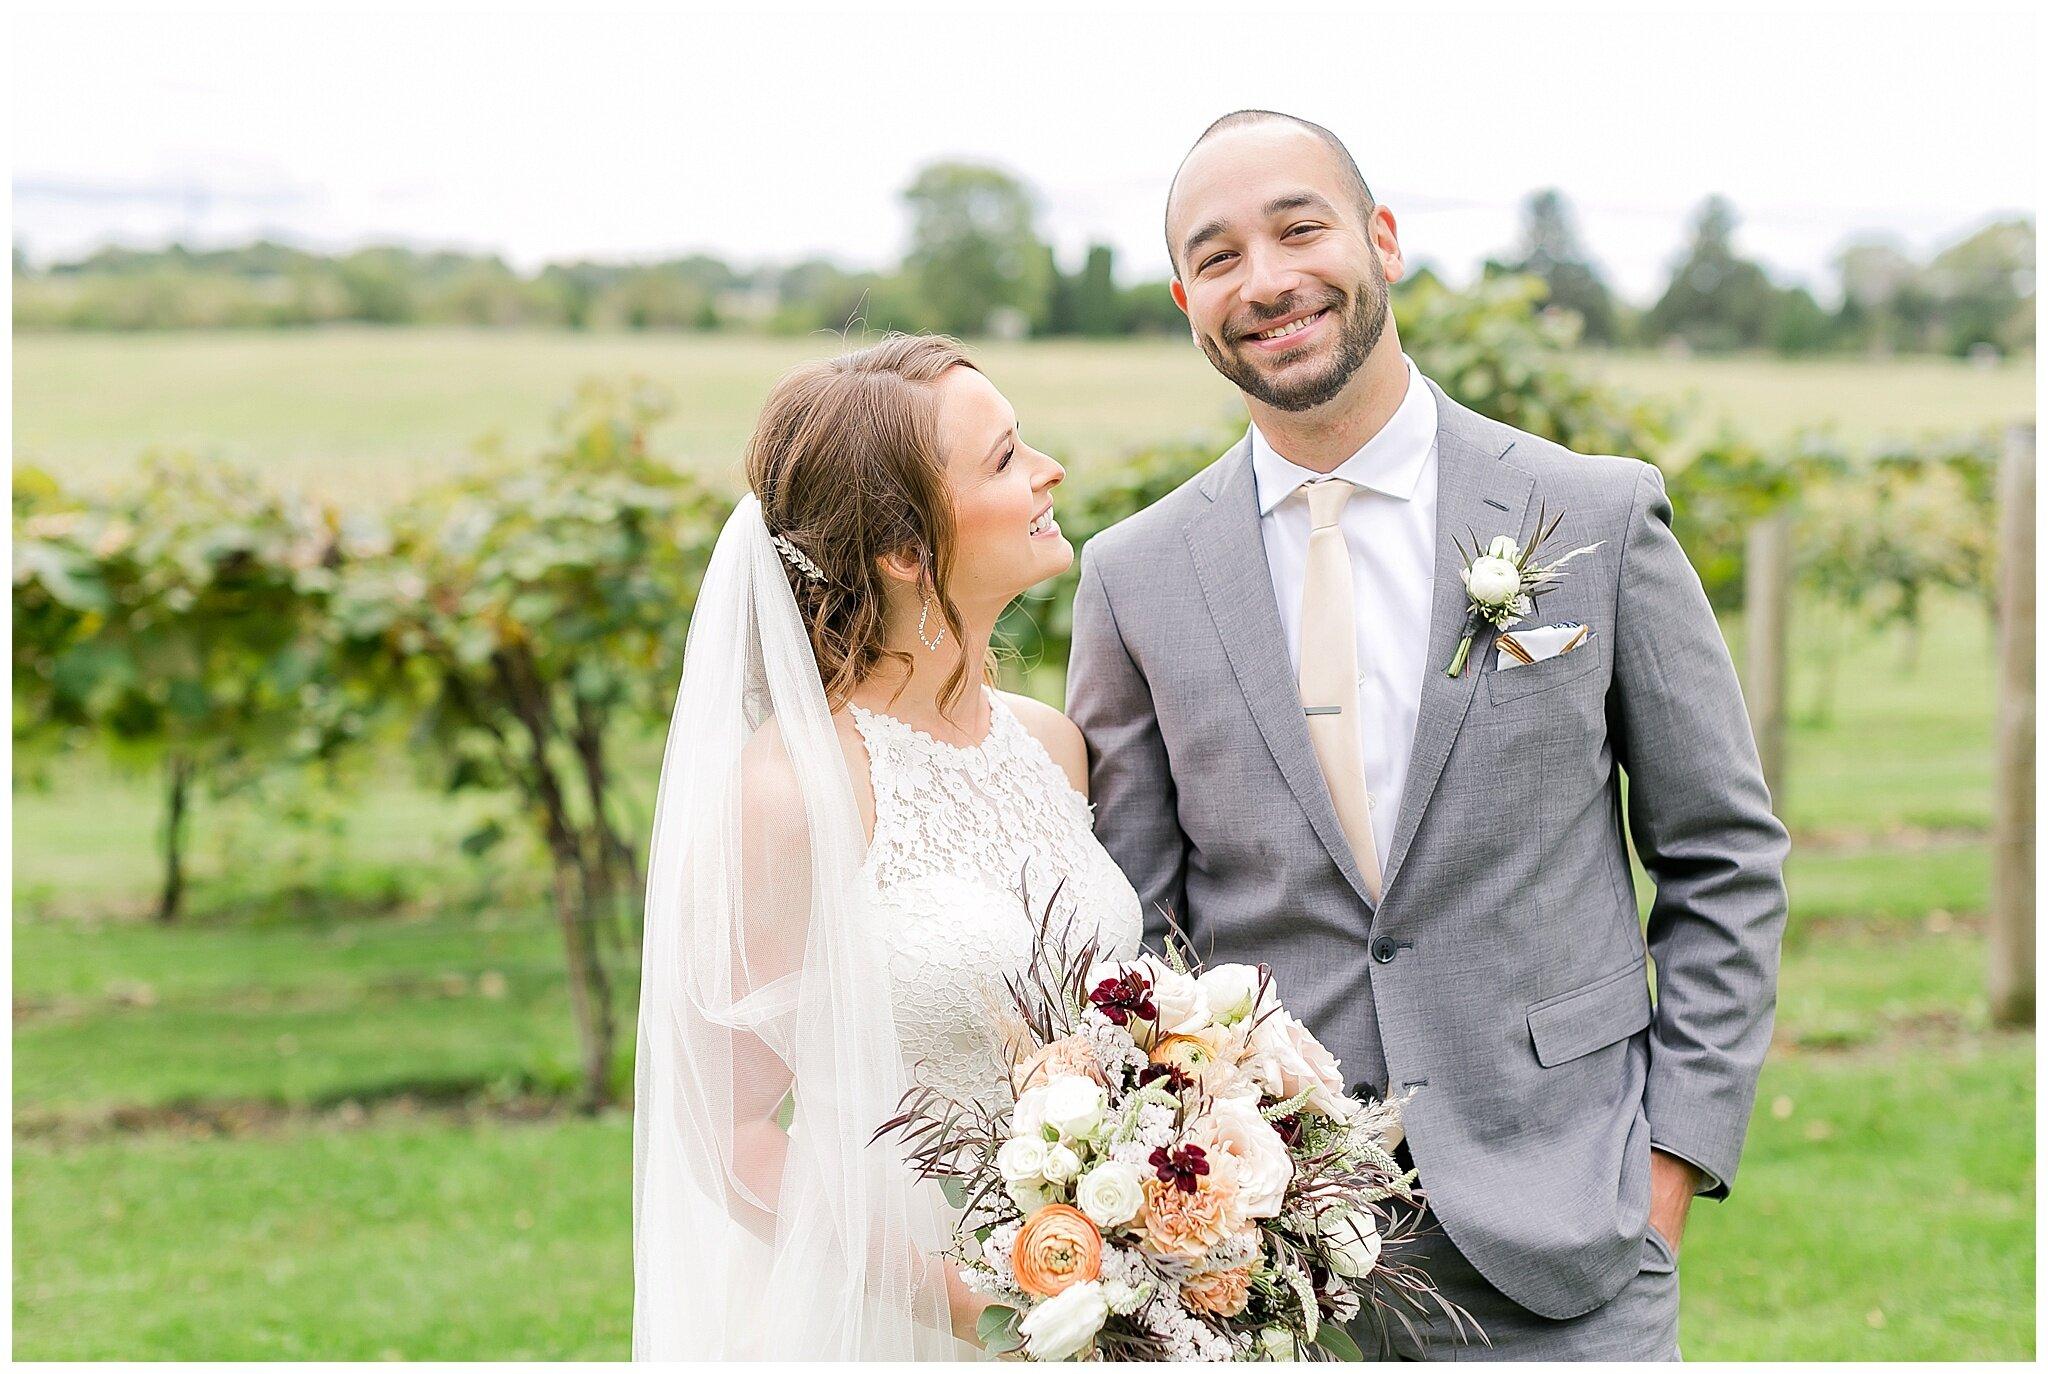 over_the_vines_edgerton_wisconsin_wedding_madison_wisconsin_photographer_0429.jpg